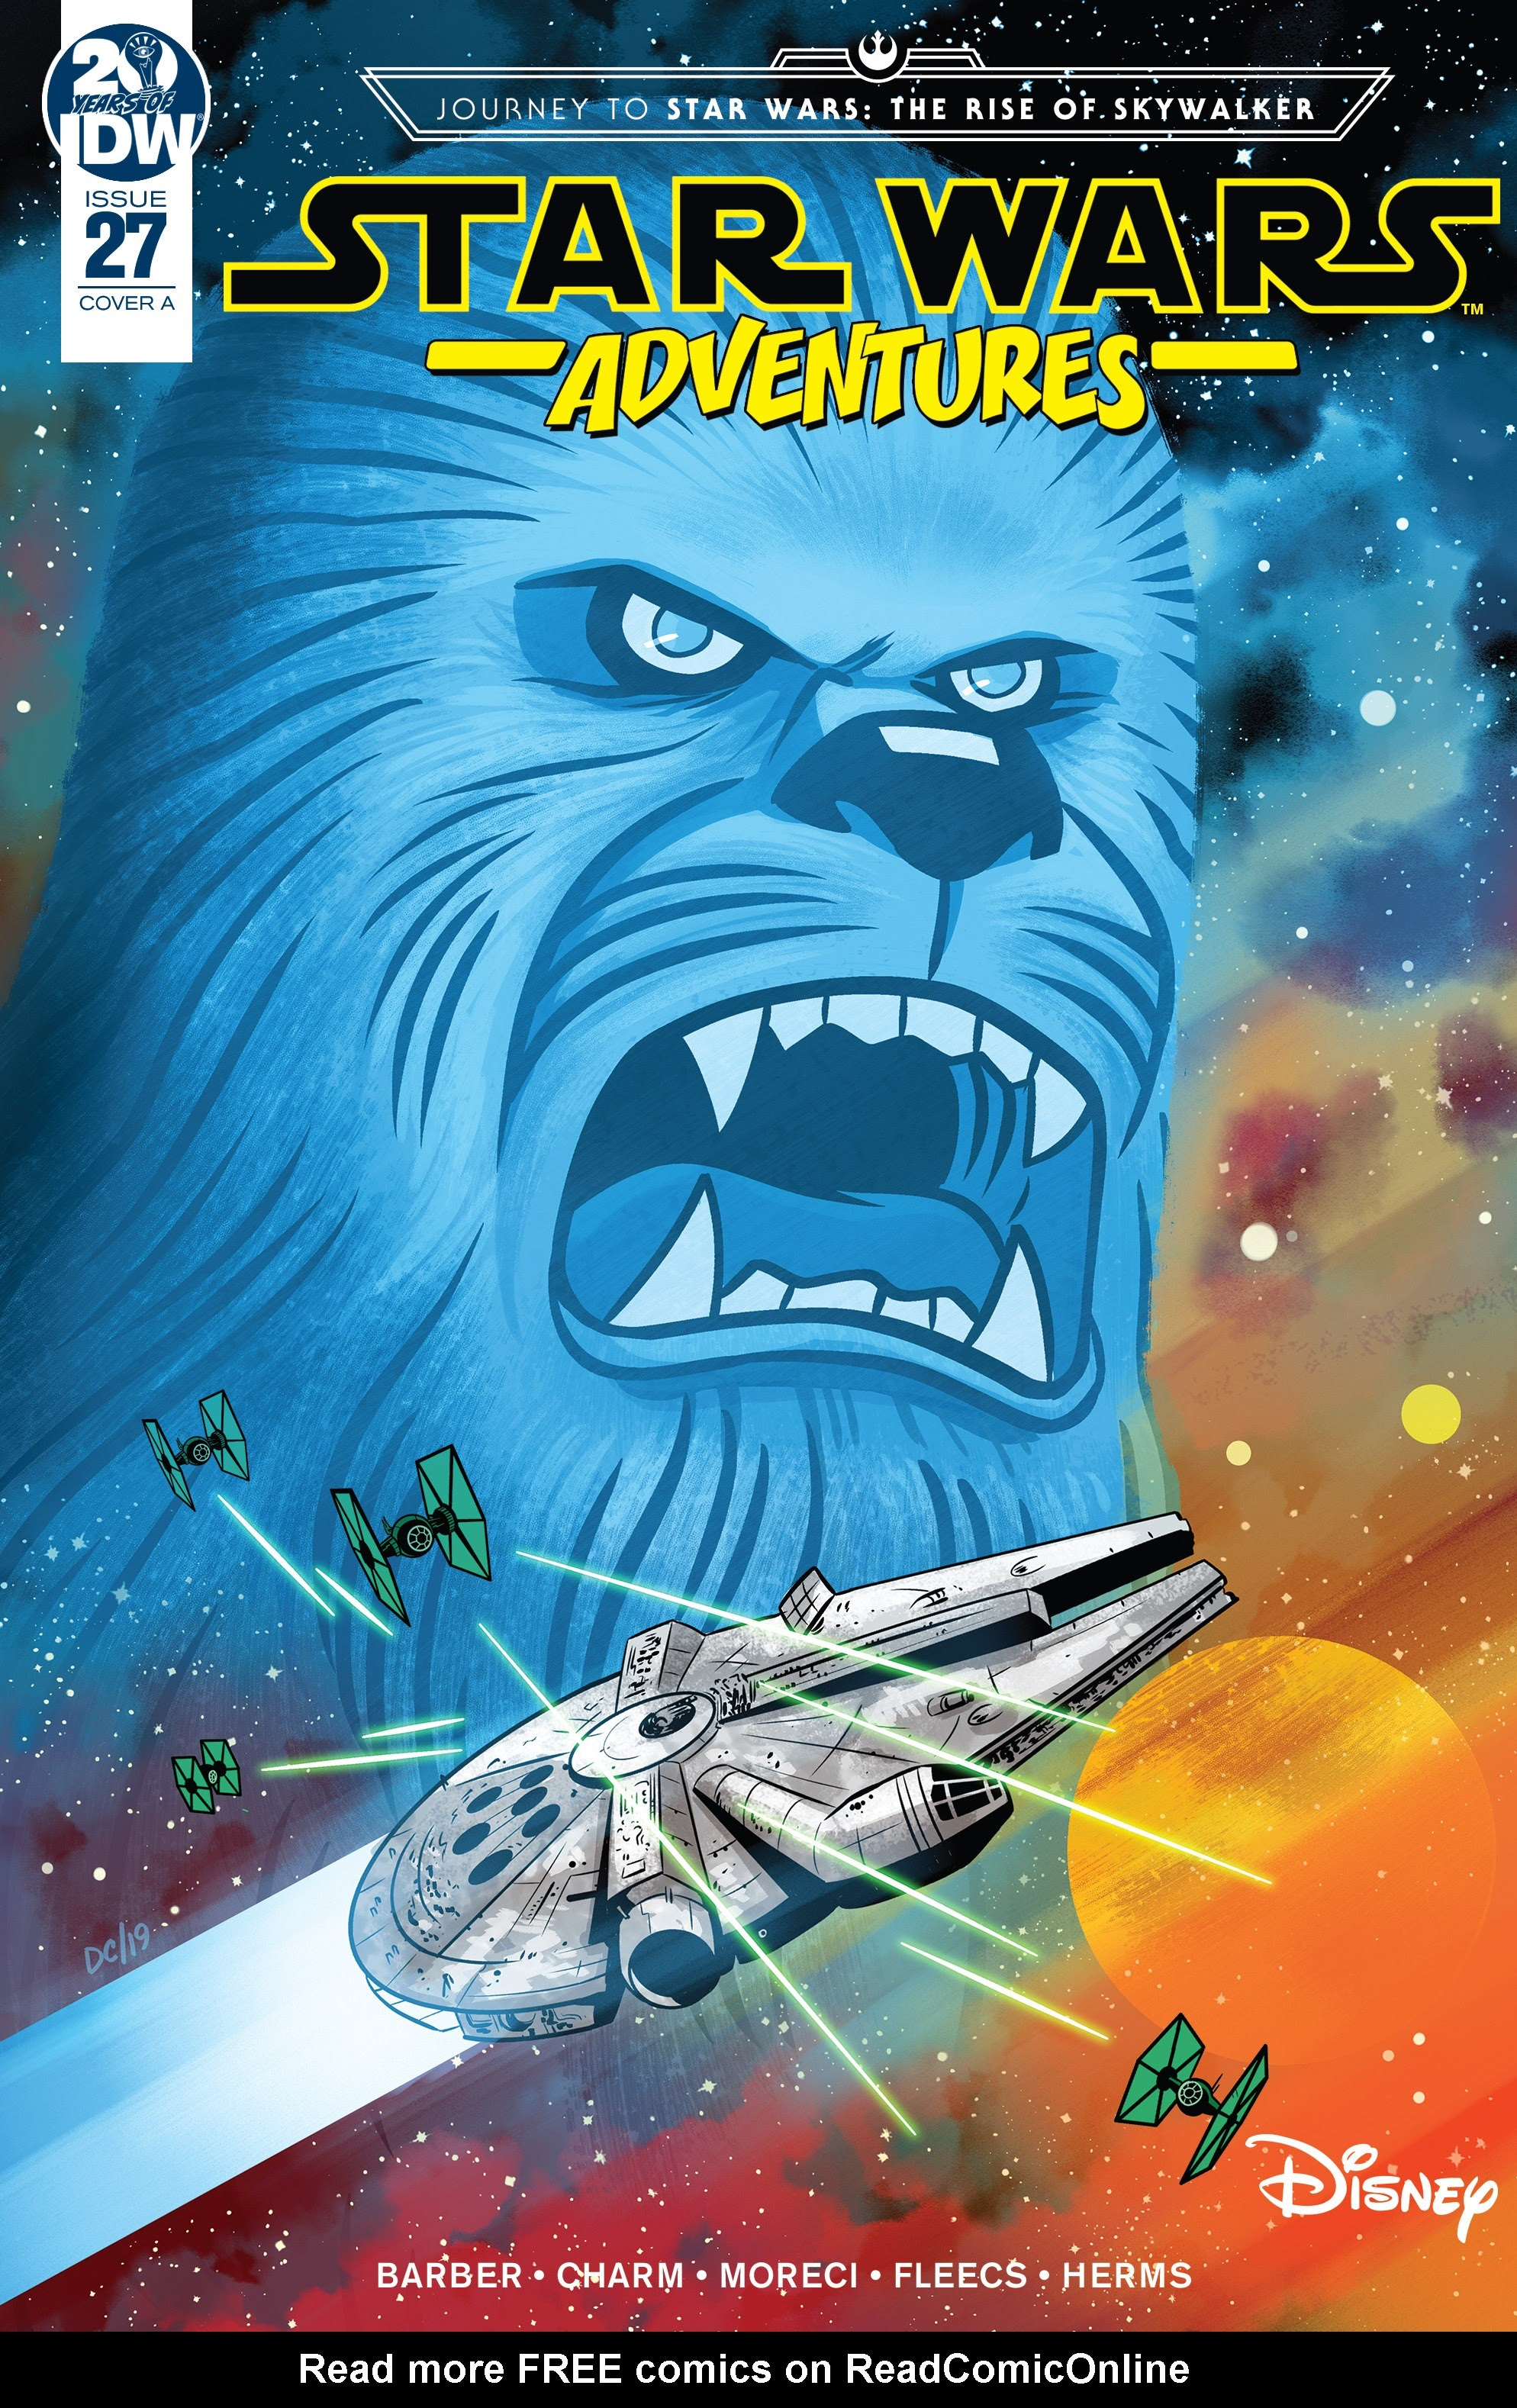 Star Wars Adventures (2017) 27 Page 1